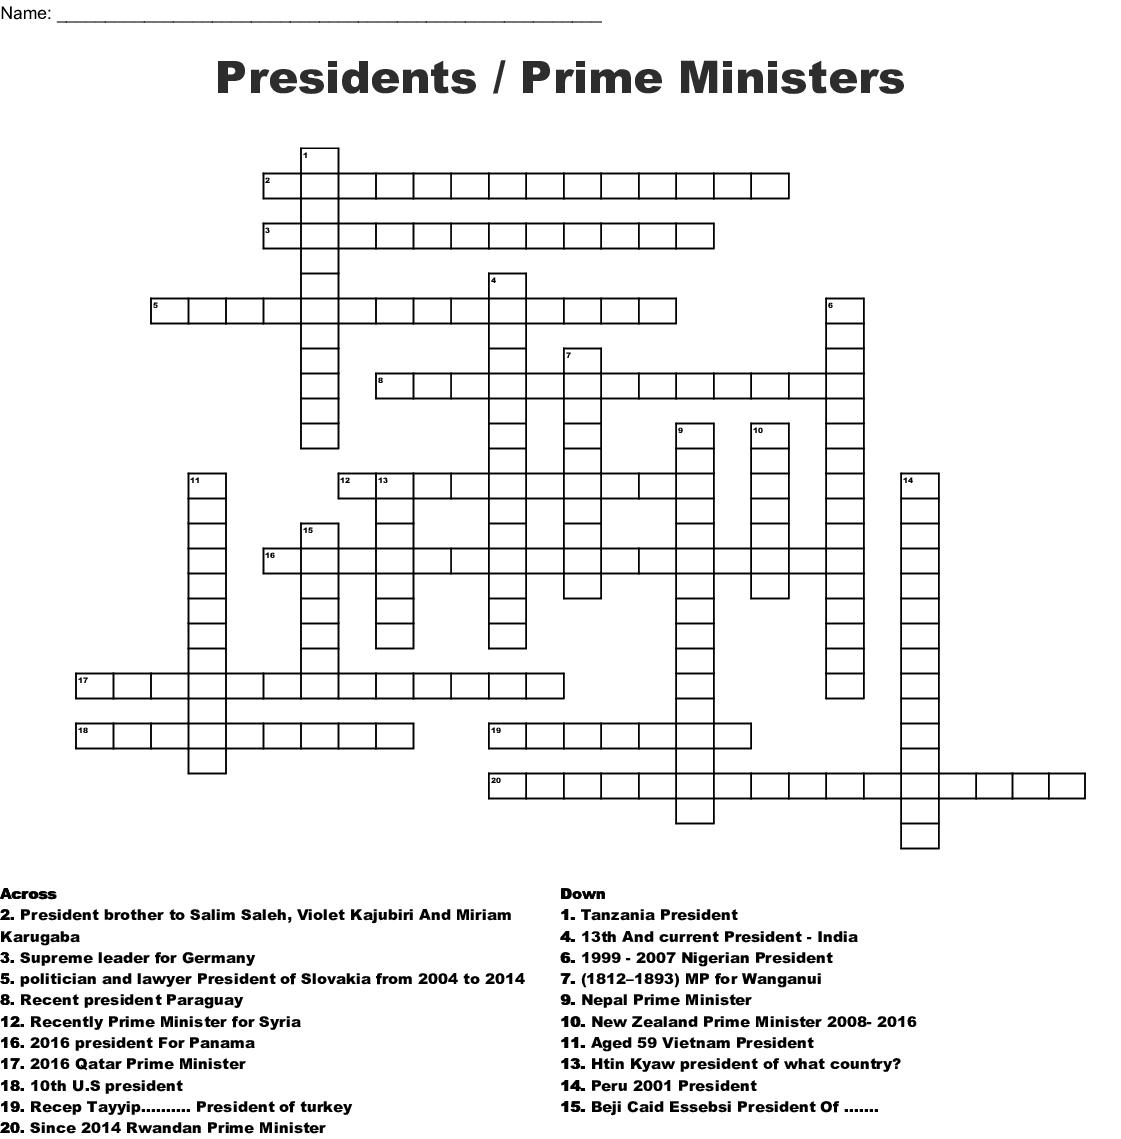 Presidents Prime Ministers Crossword Wordmint